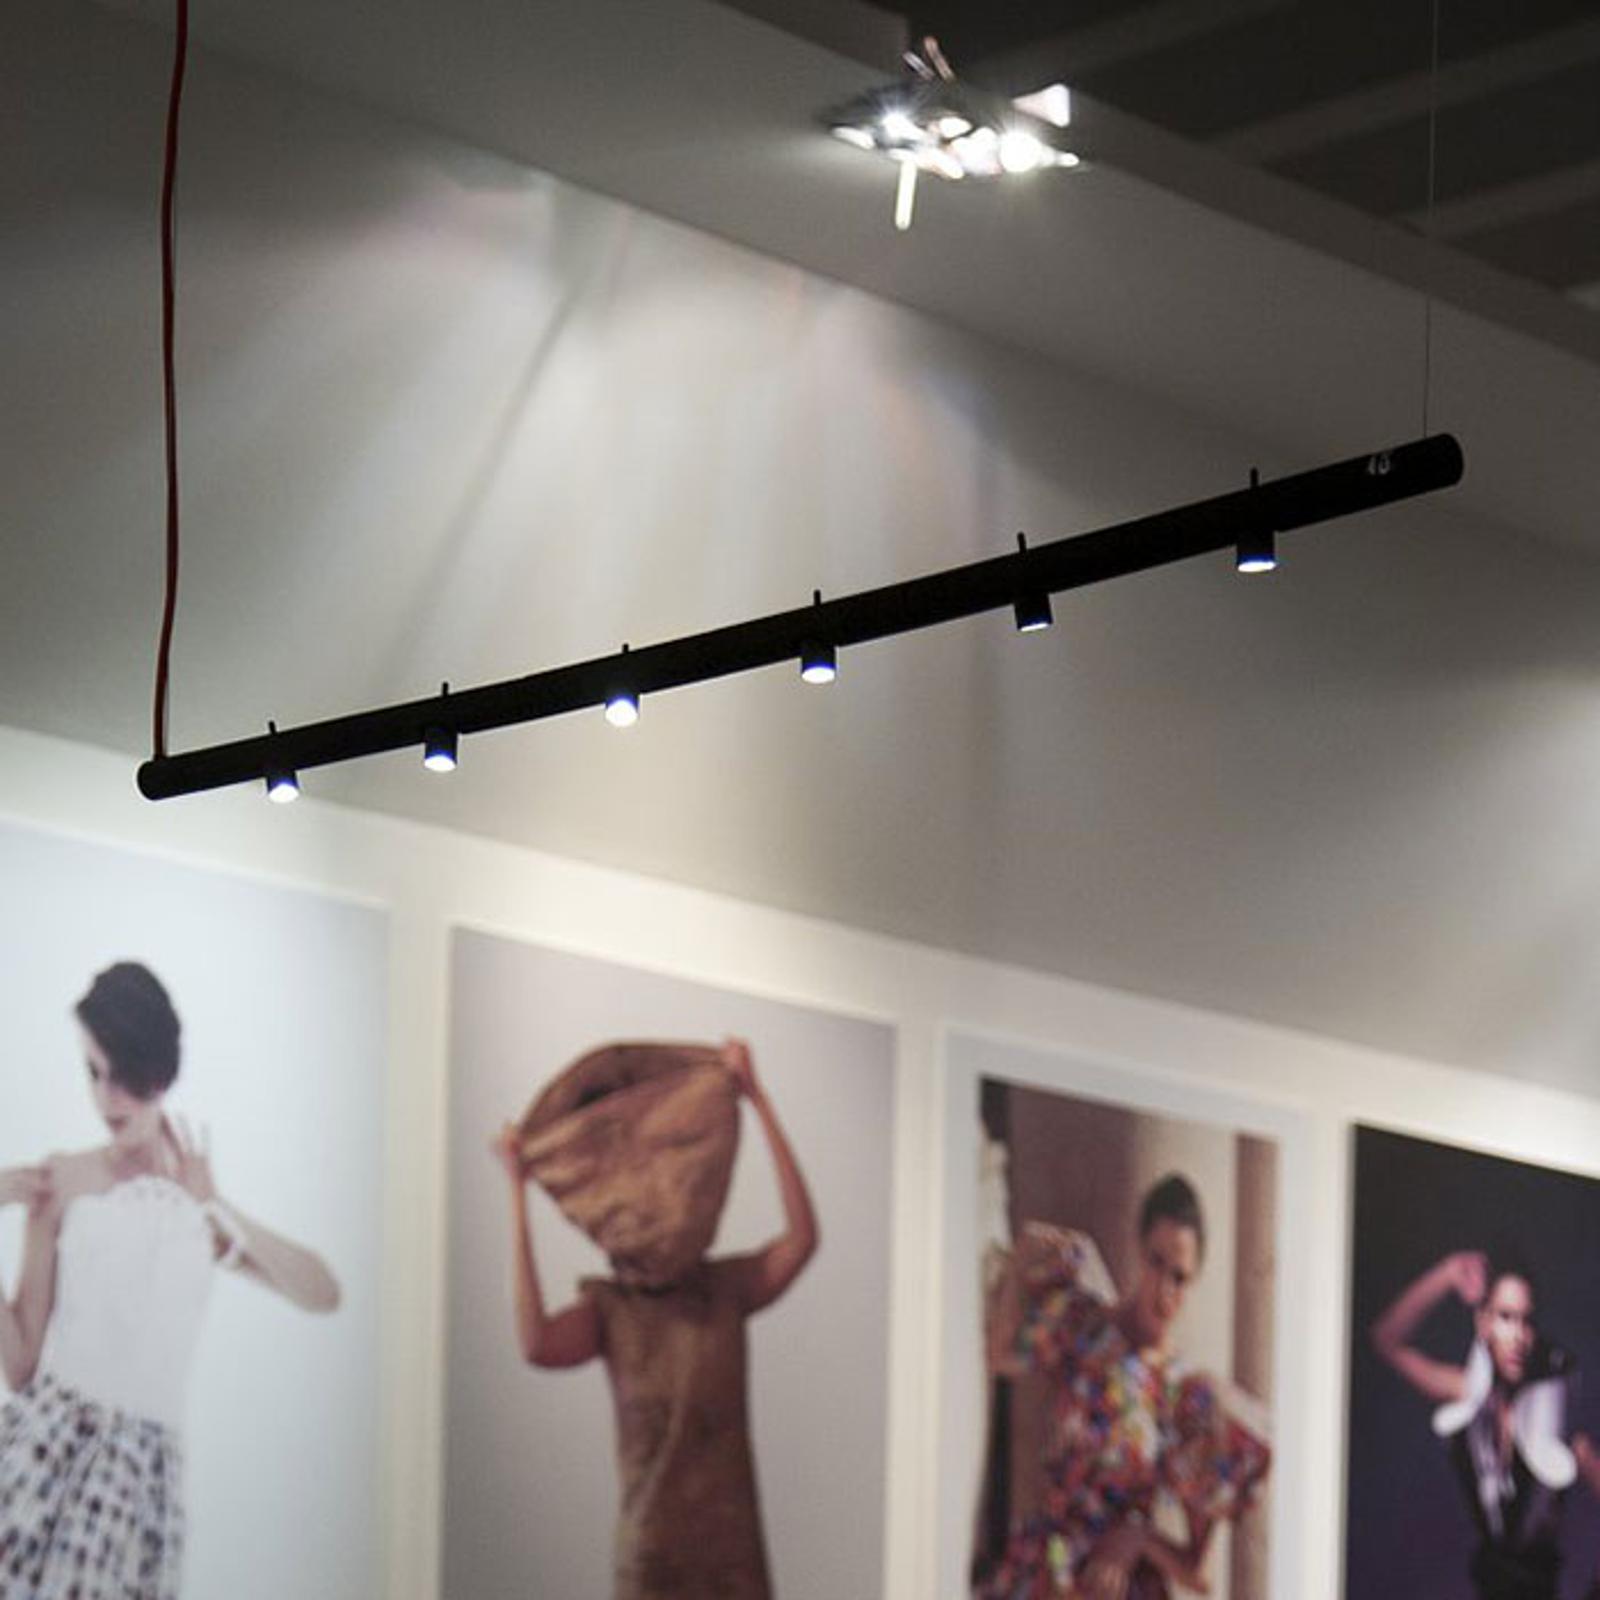 Martinelli Luce Colibrì LED-hänglampa 6 lampor